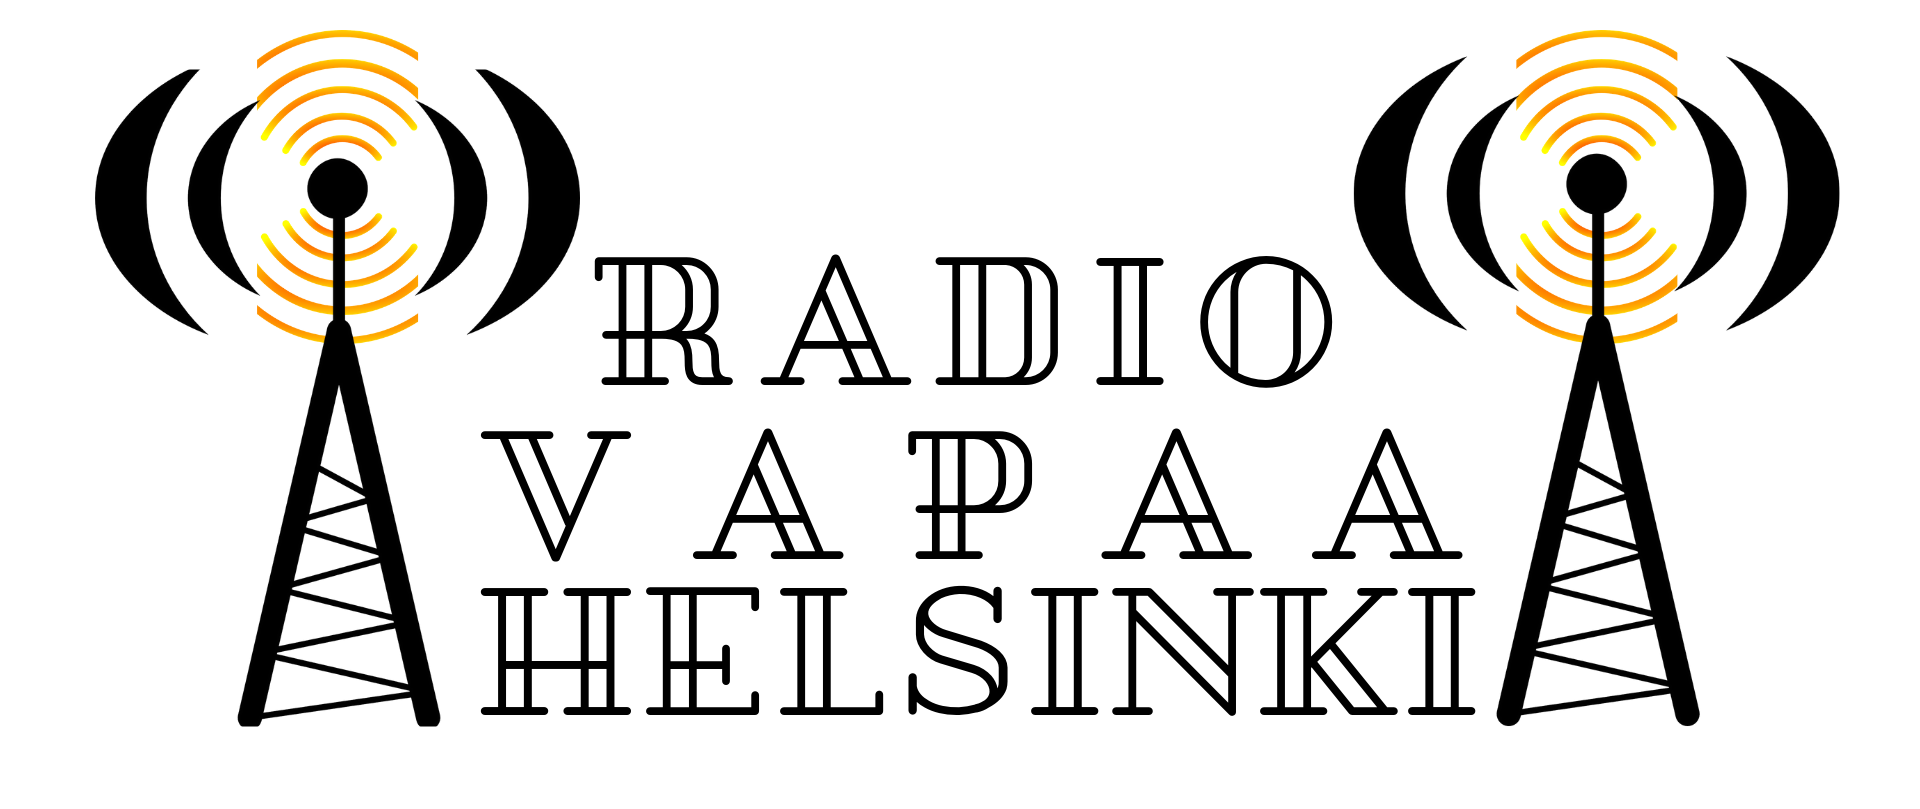 Logo for Radio Vapaa - Helsinki